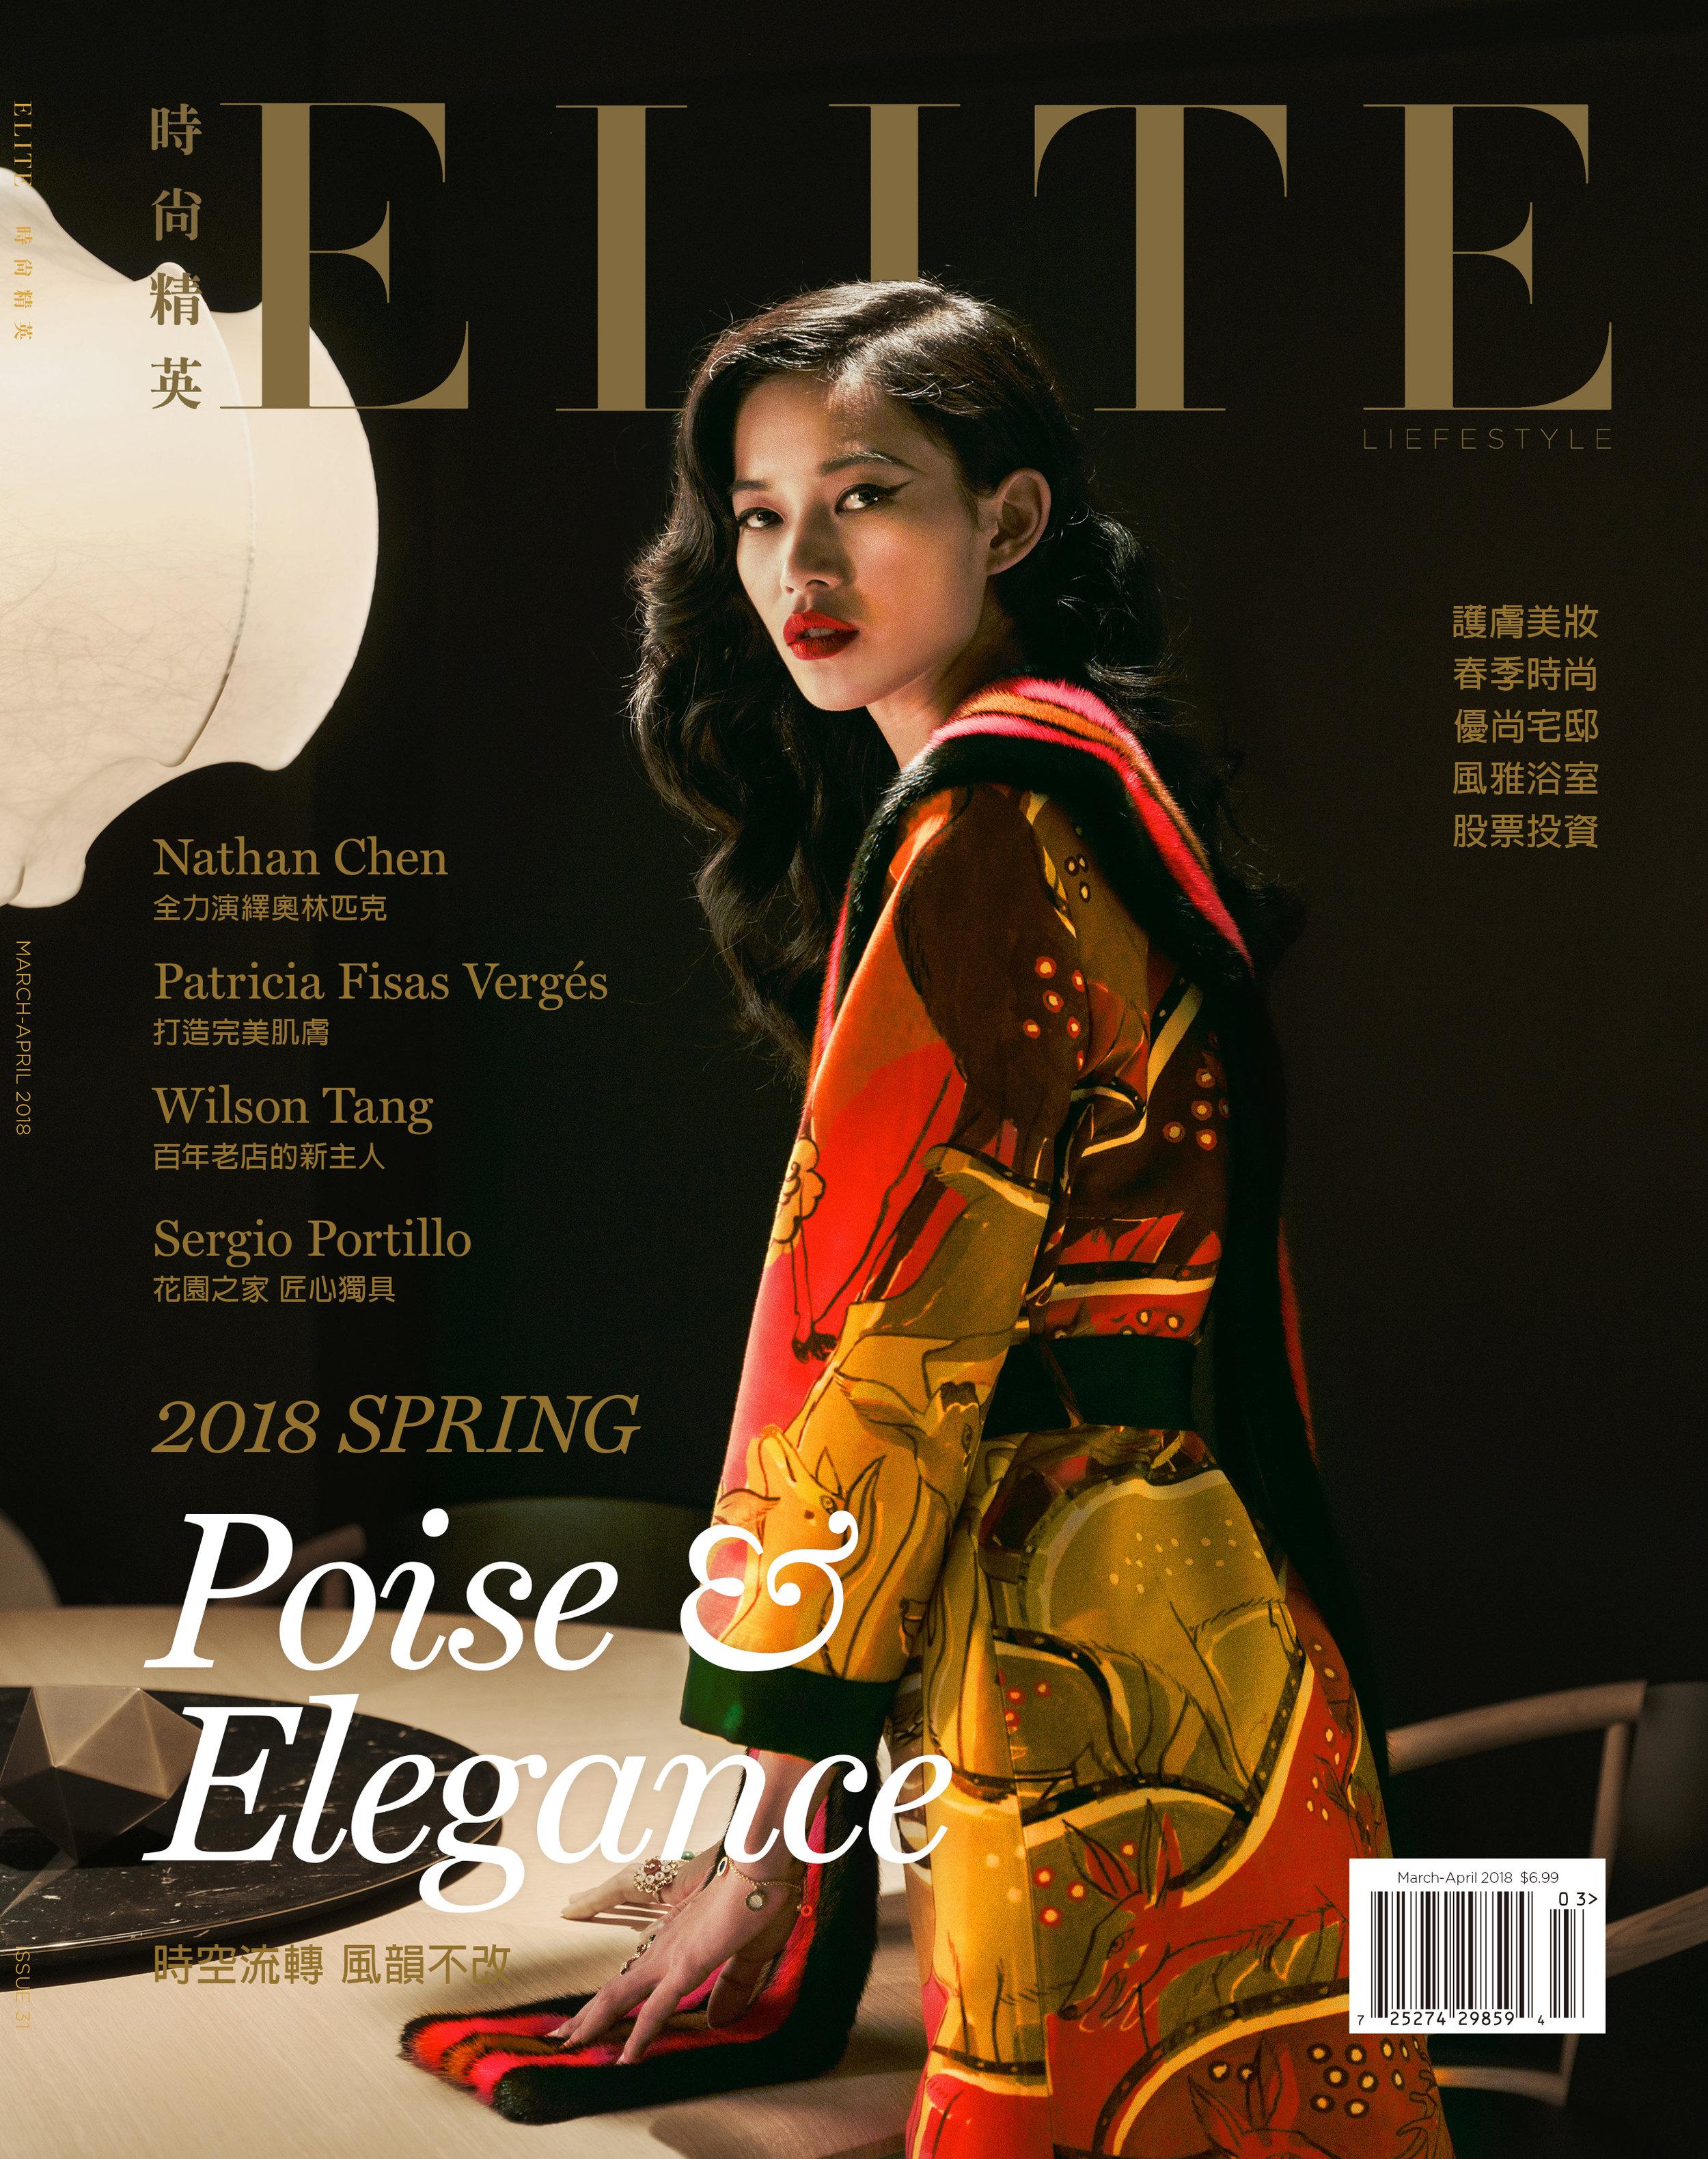 Poise and Elegance Cover.jpg